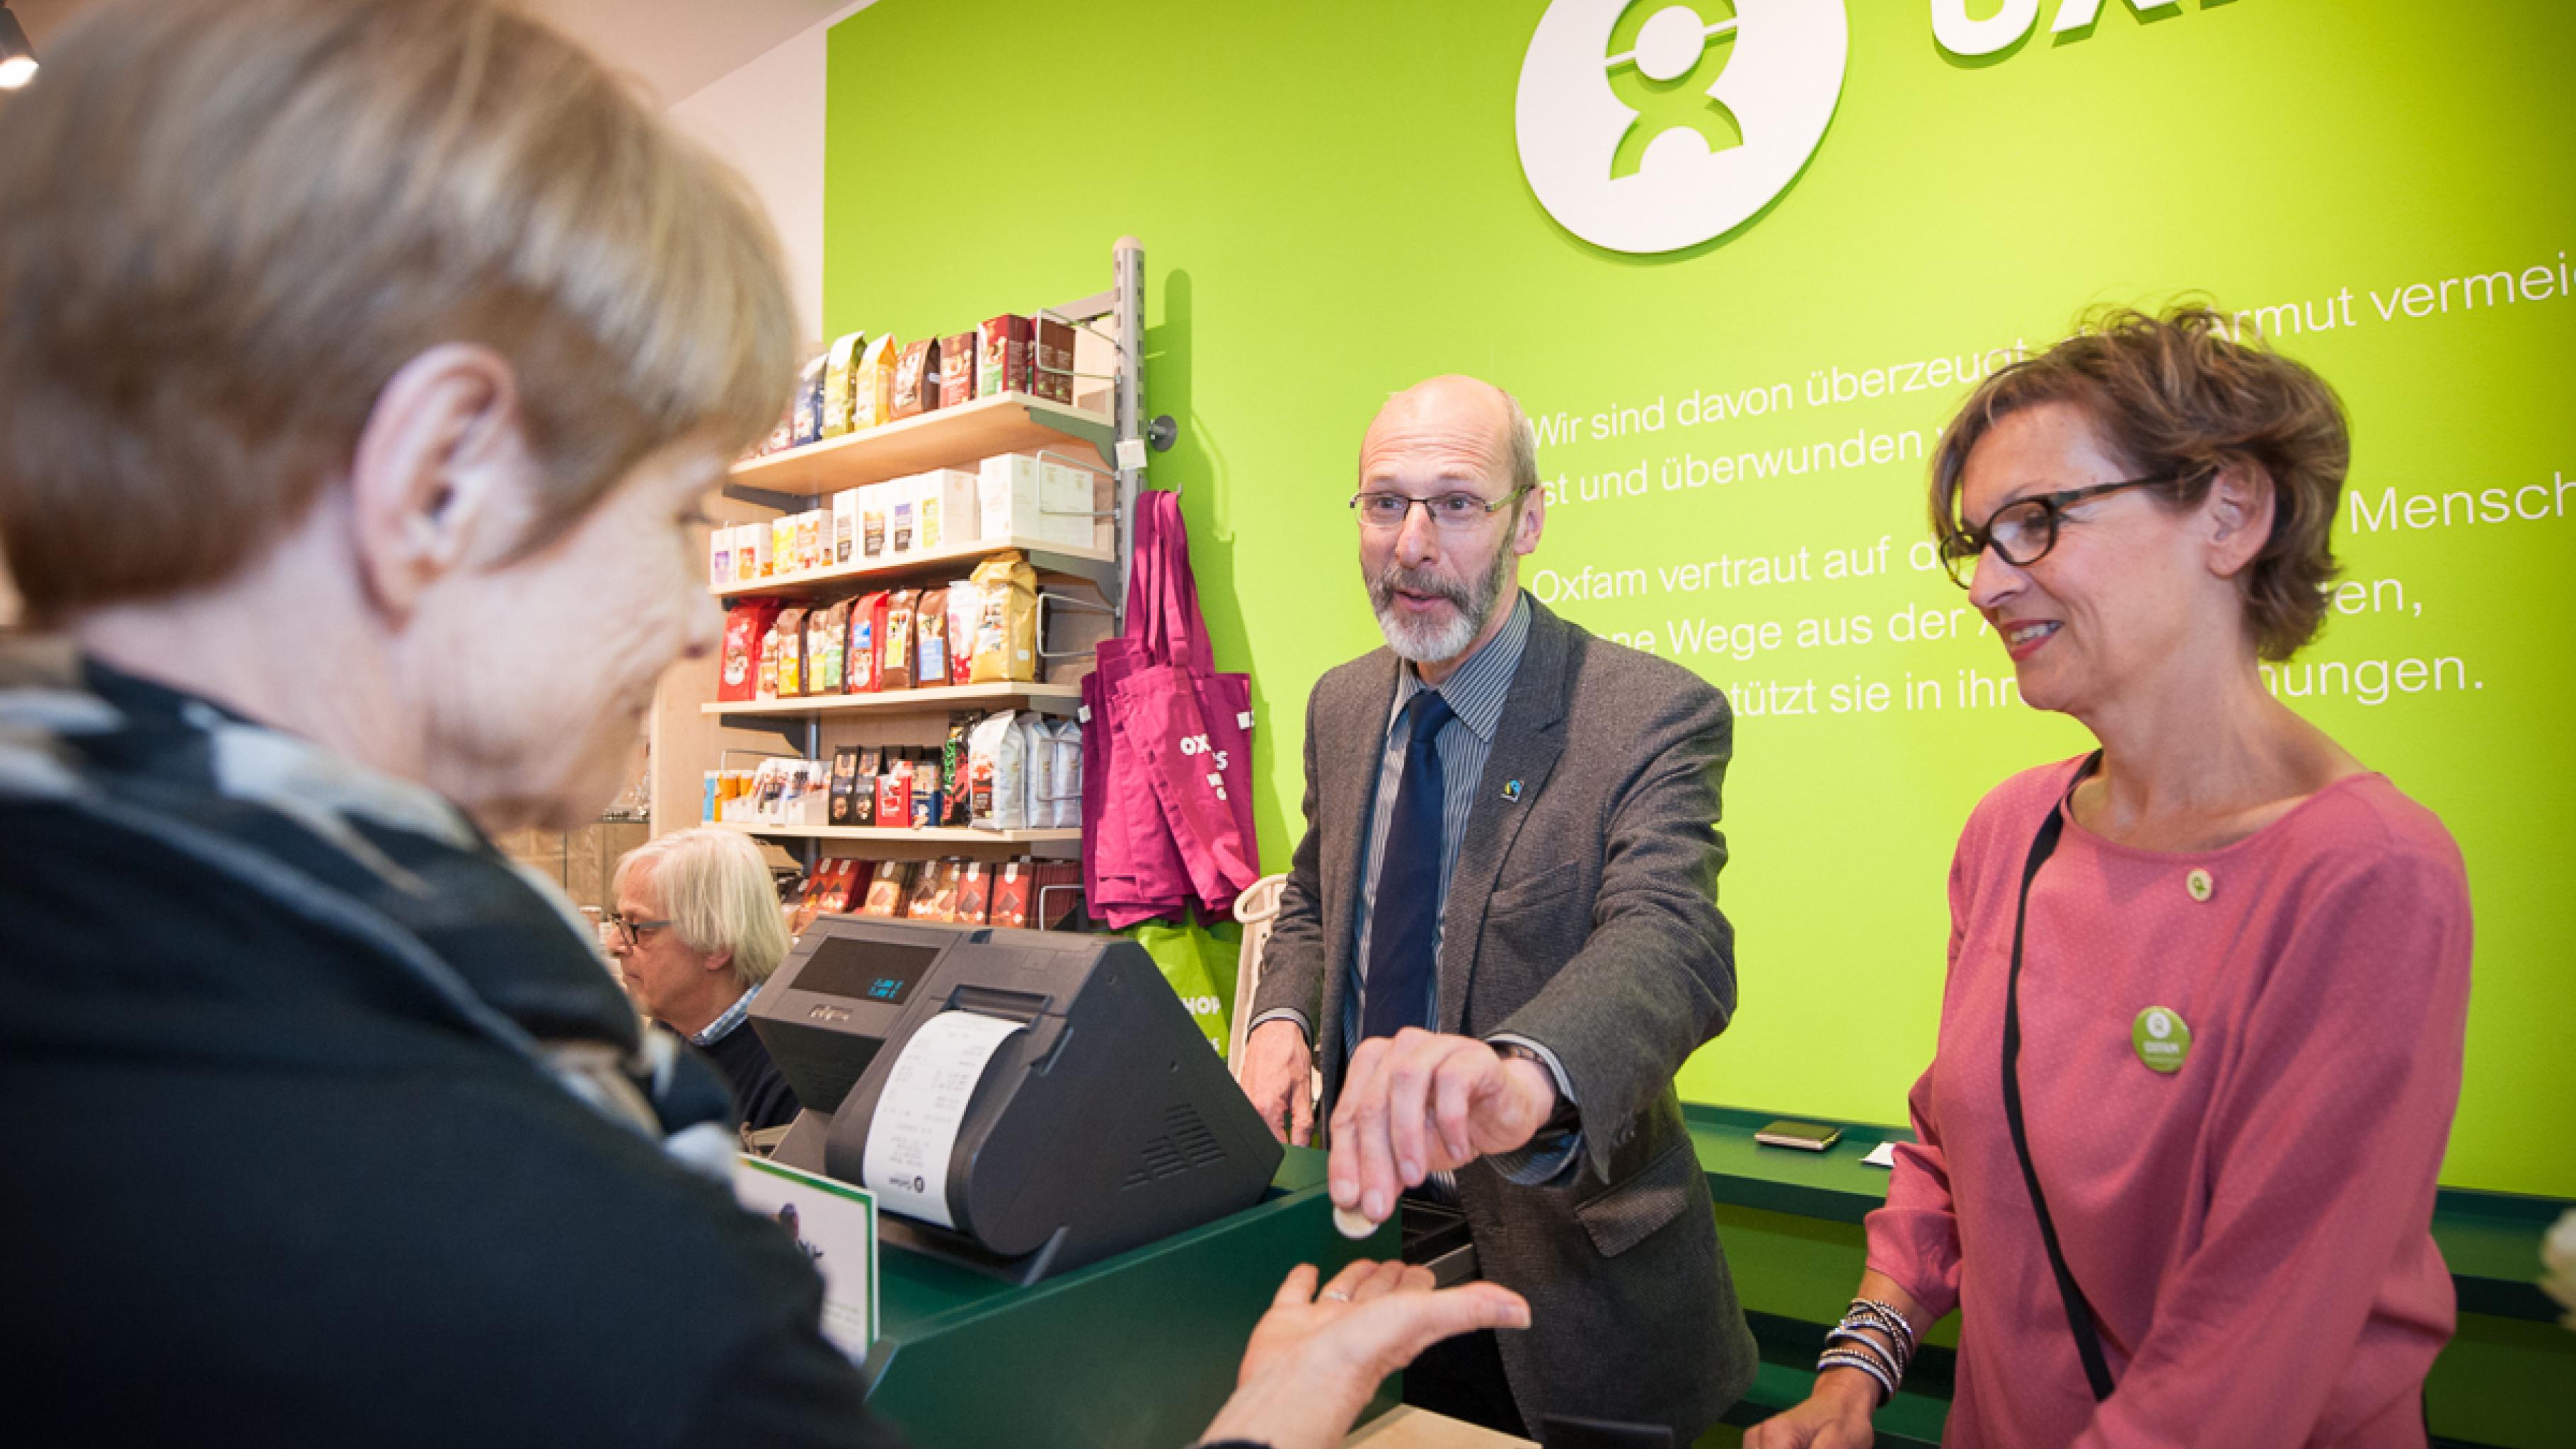 Oxfam Shop Karlsruhe - Bürgermeister Klaus Stapf an der Kasse